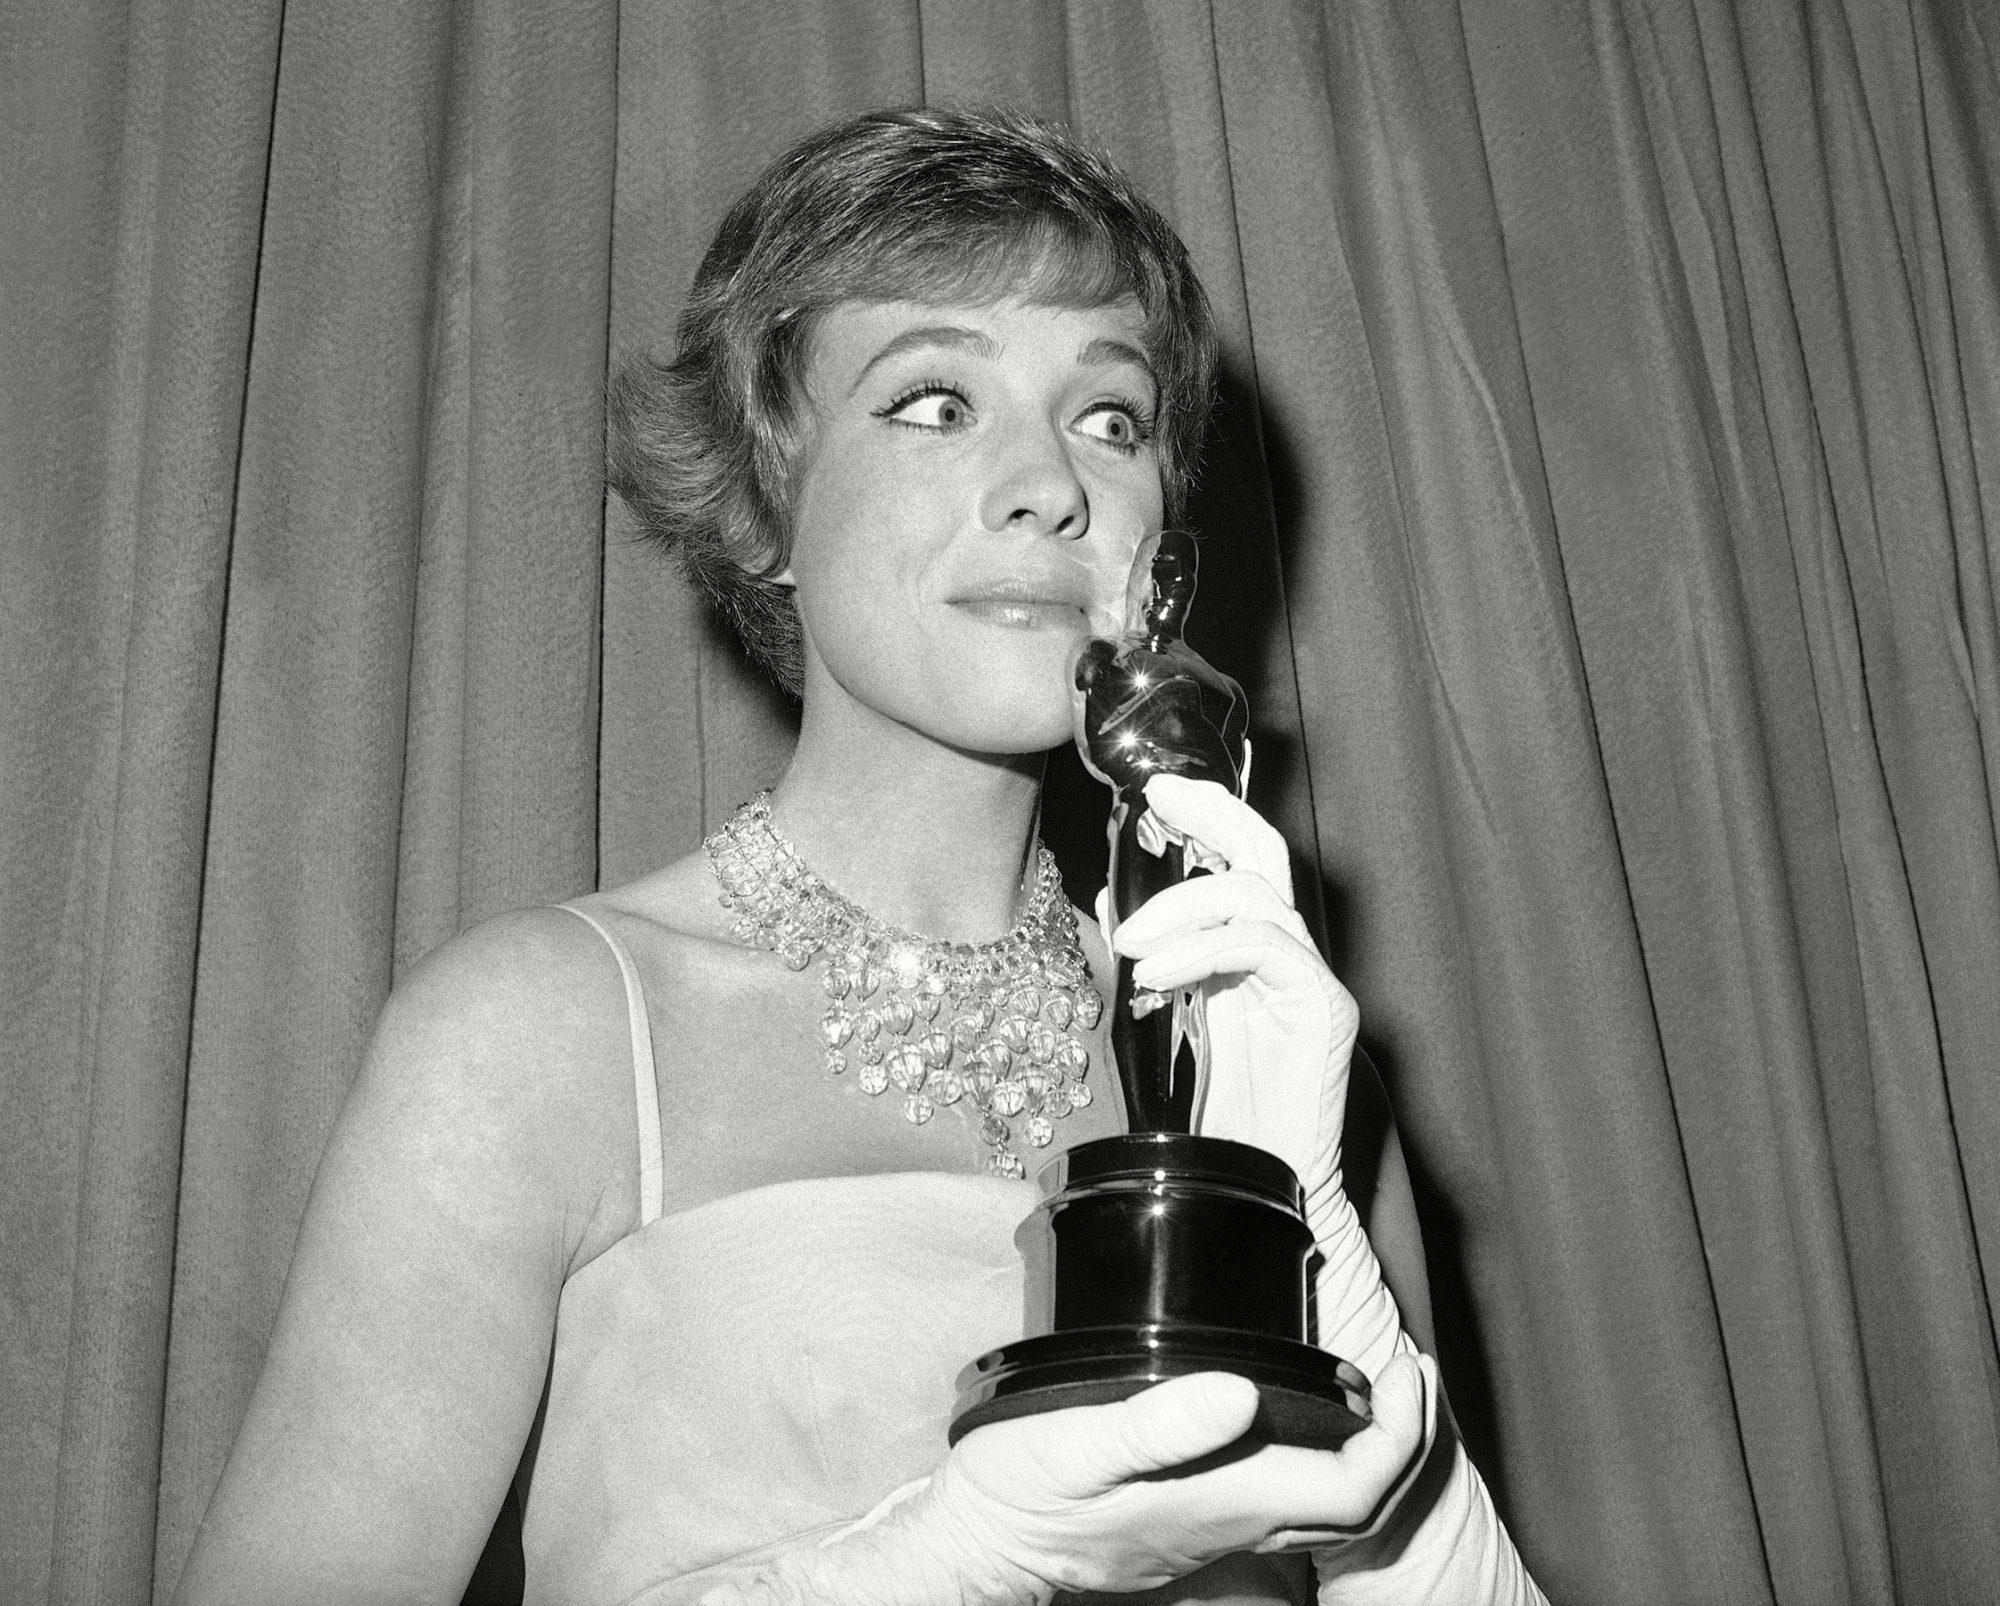 Oscars Julie Andrews 1965, Santa Monica, USA